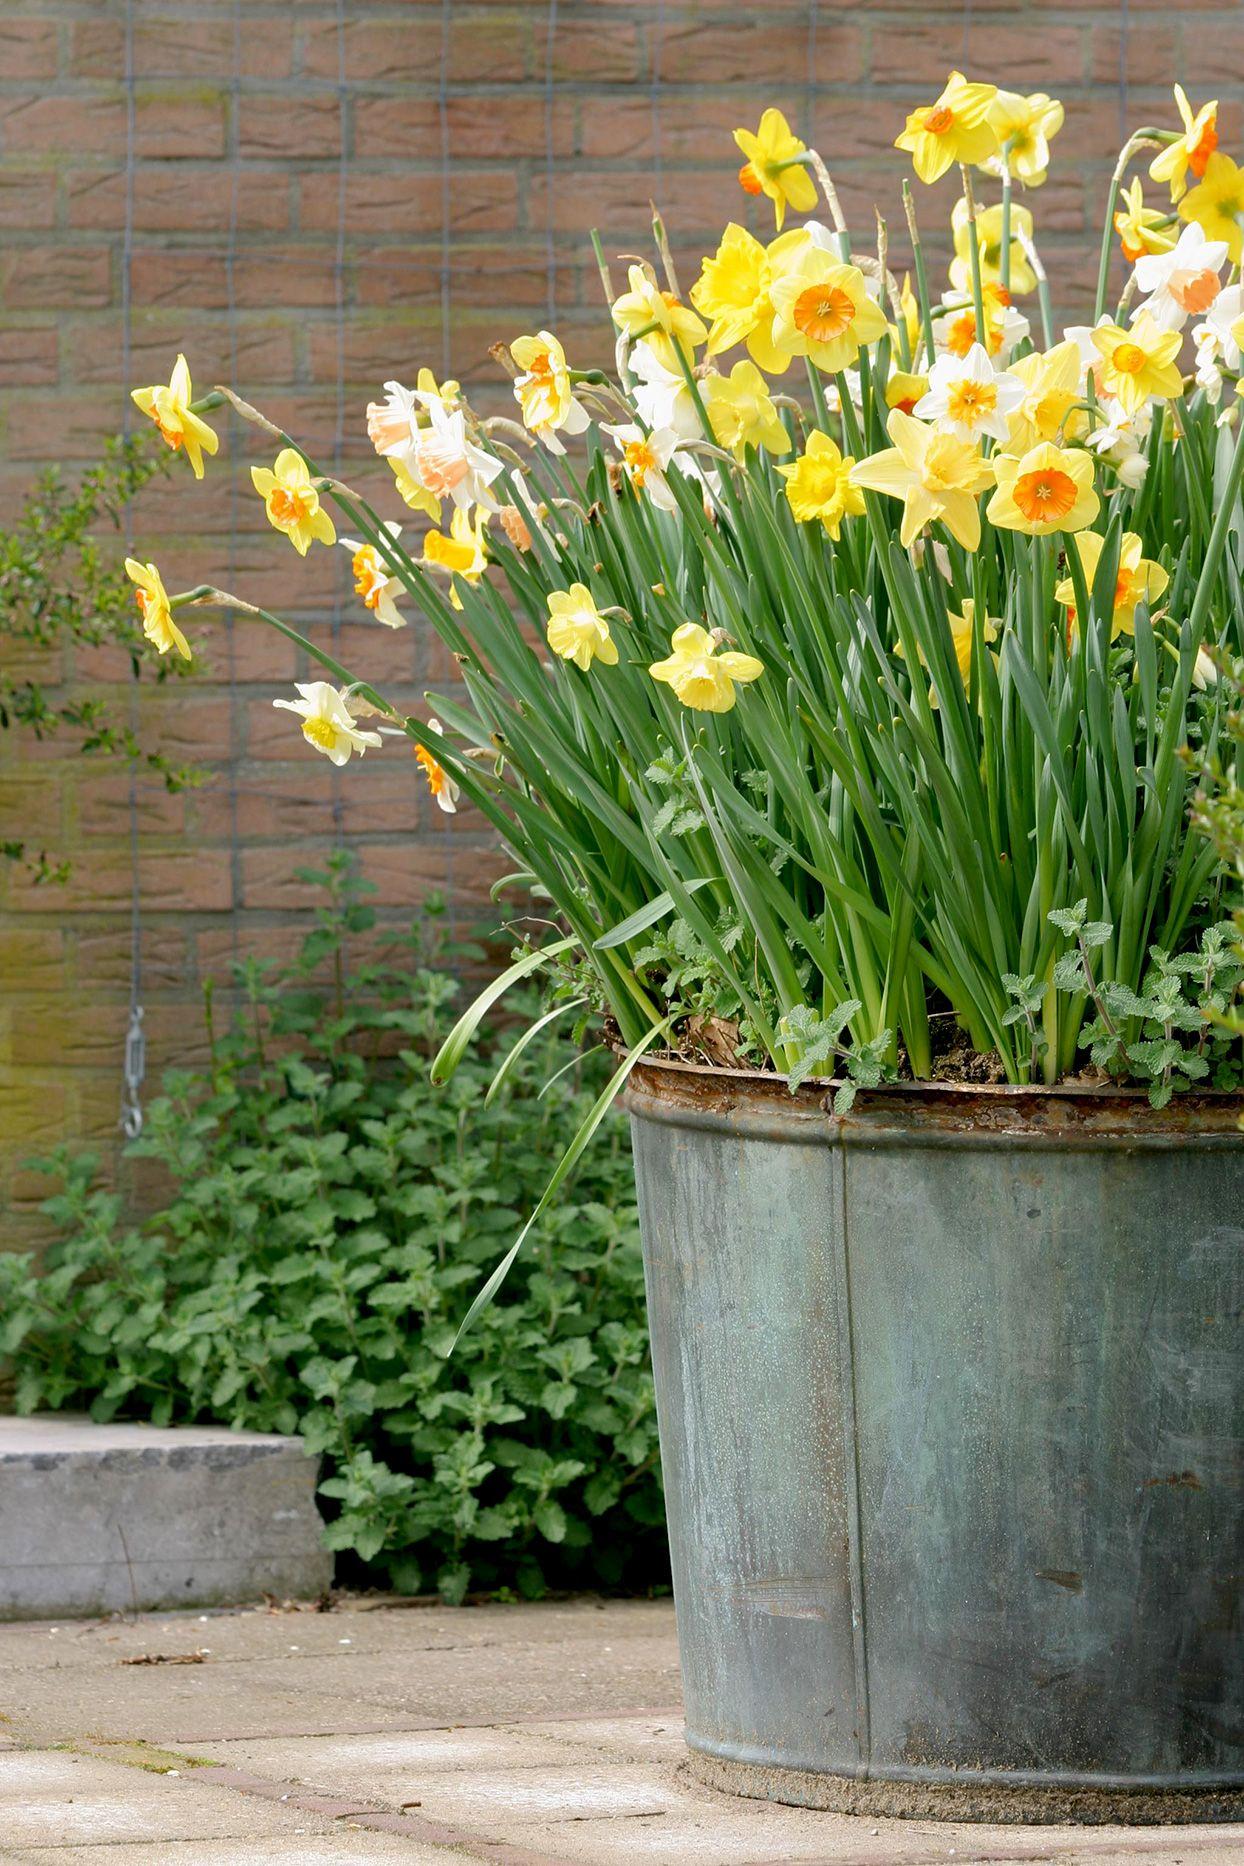 Daffodil Garden Acreage Landscaping Daffodil Gardening Landscape